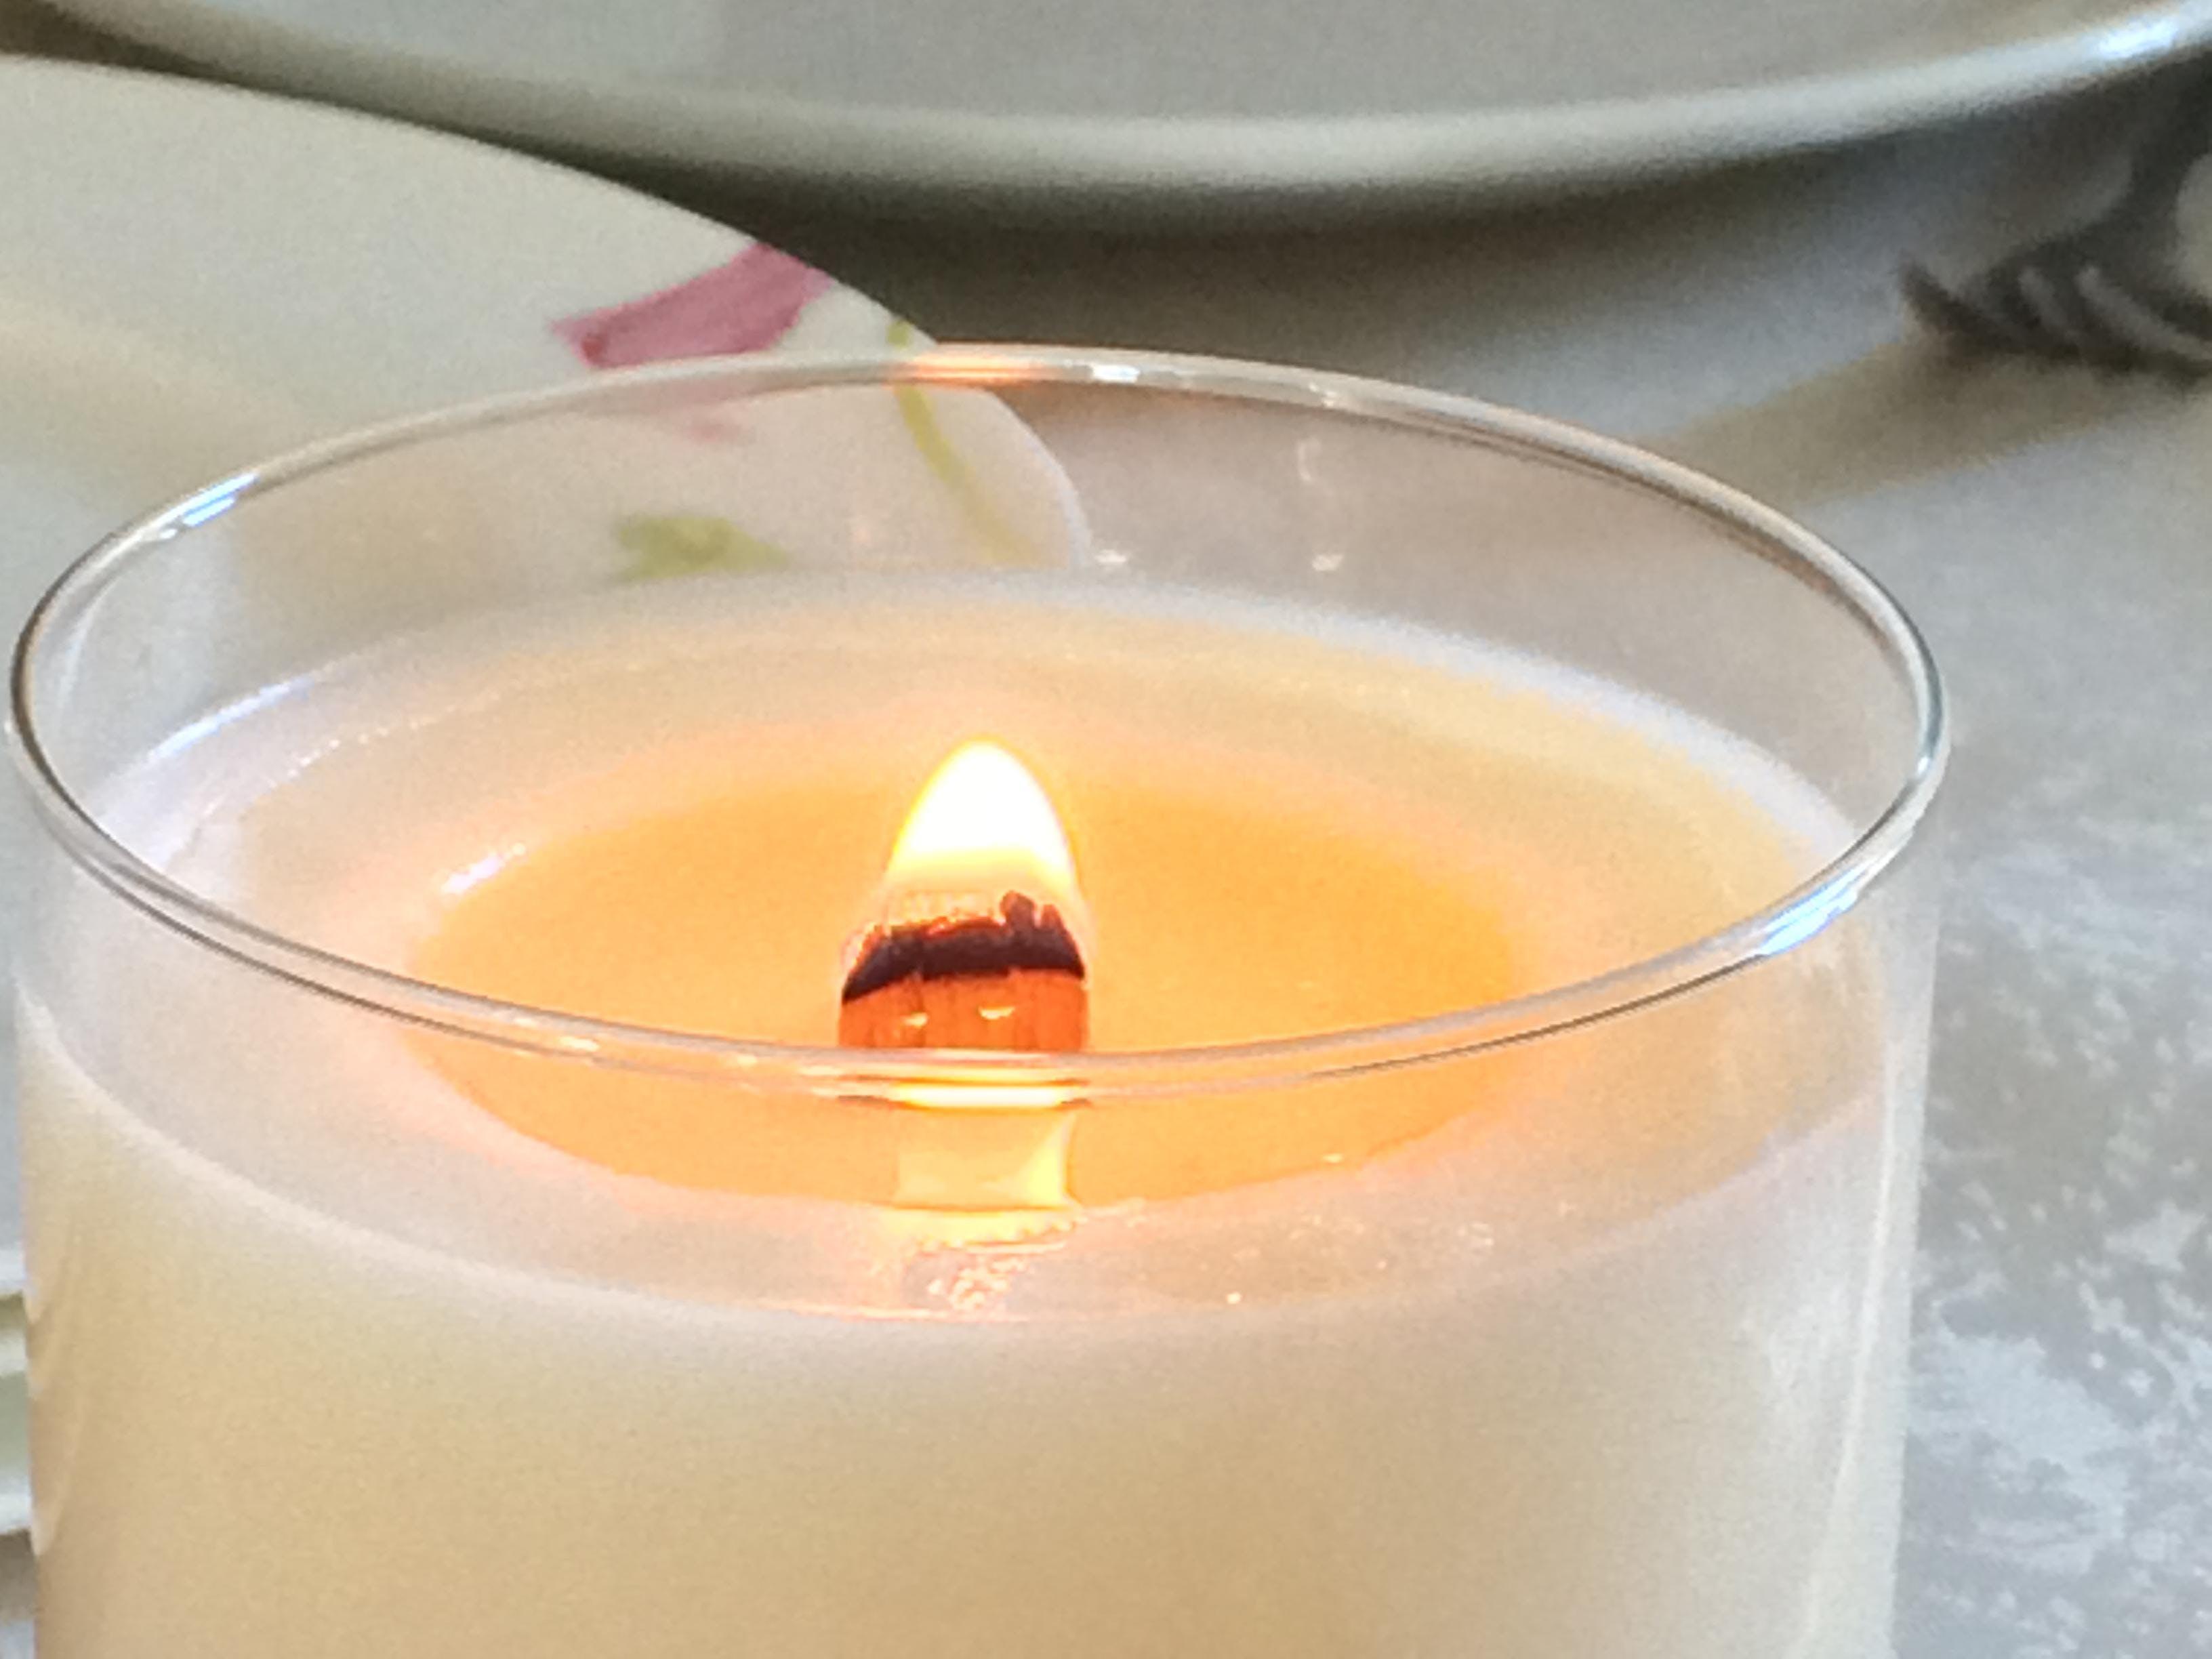 Atelier de fabrication de bougies